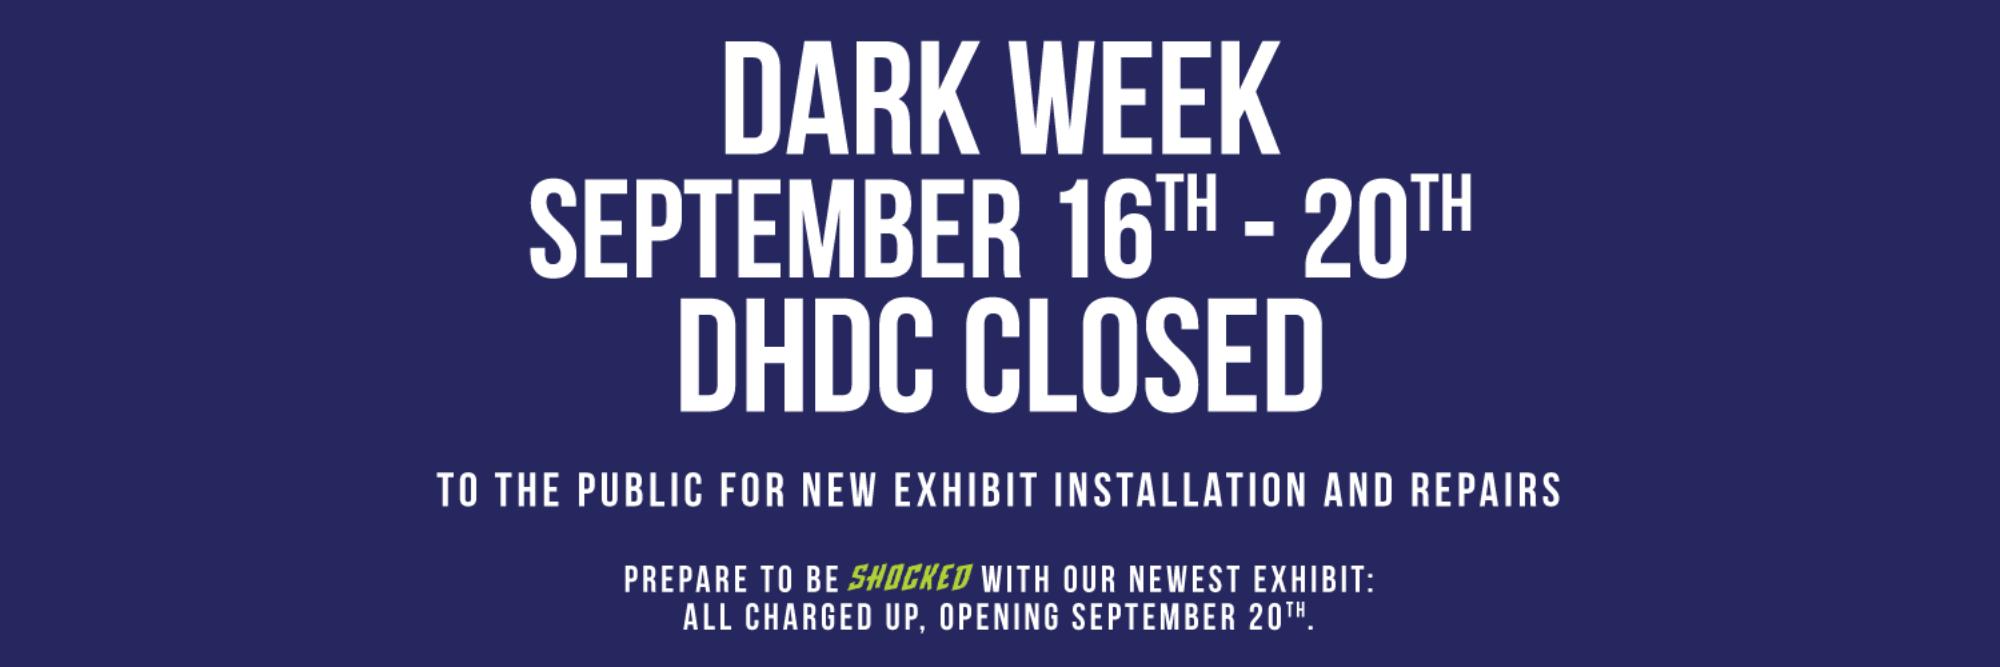 DarkWeekWebSlider